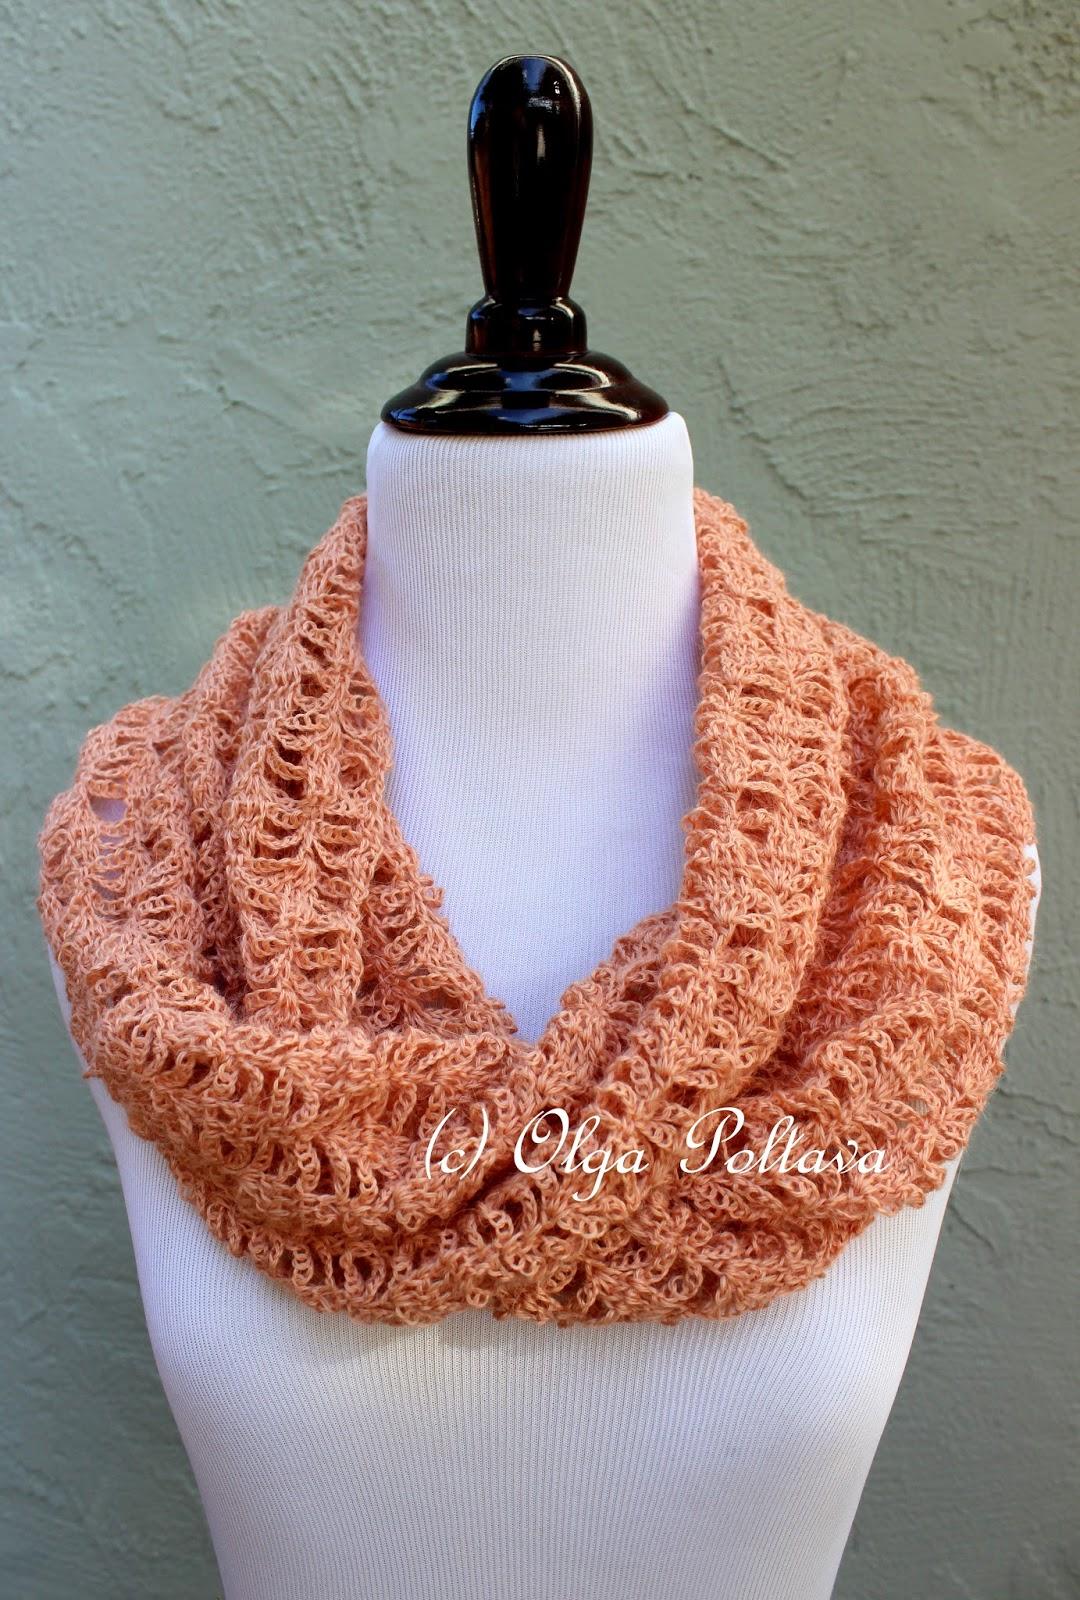 Lacy Crochet Peach Lace Infinity Crochet Scarf